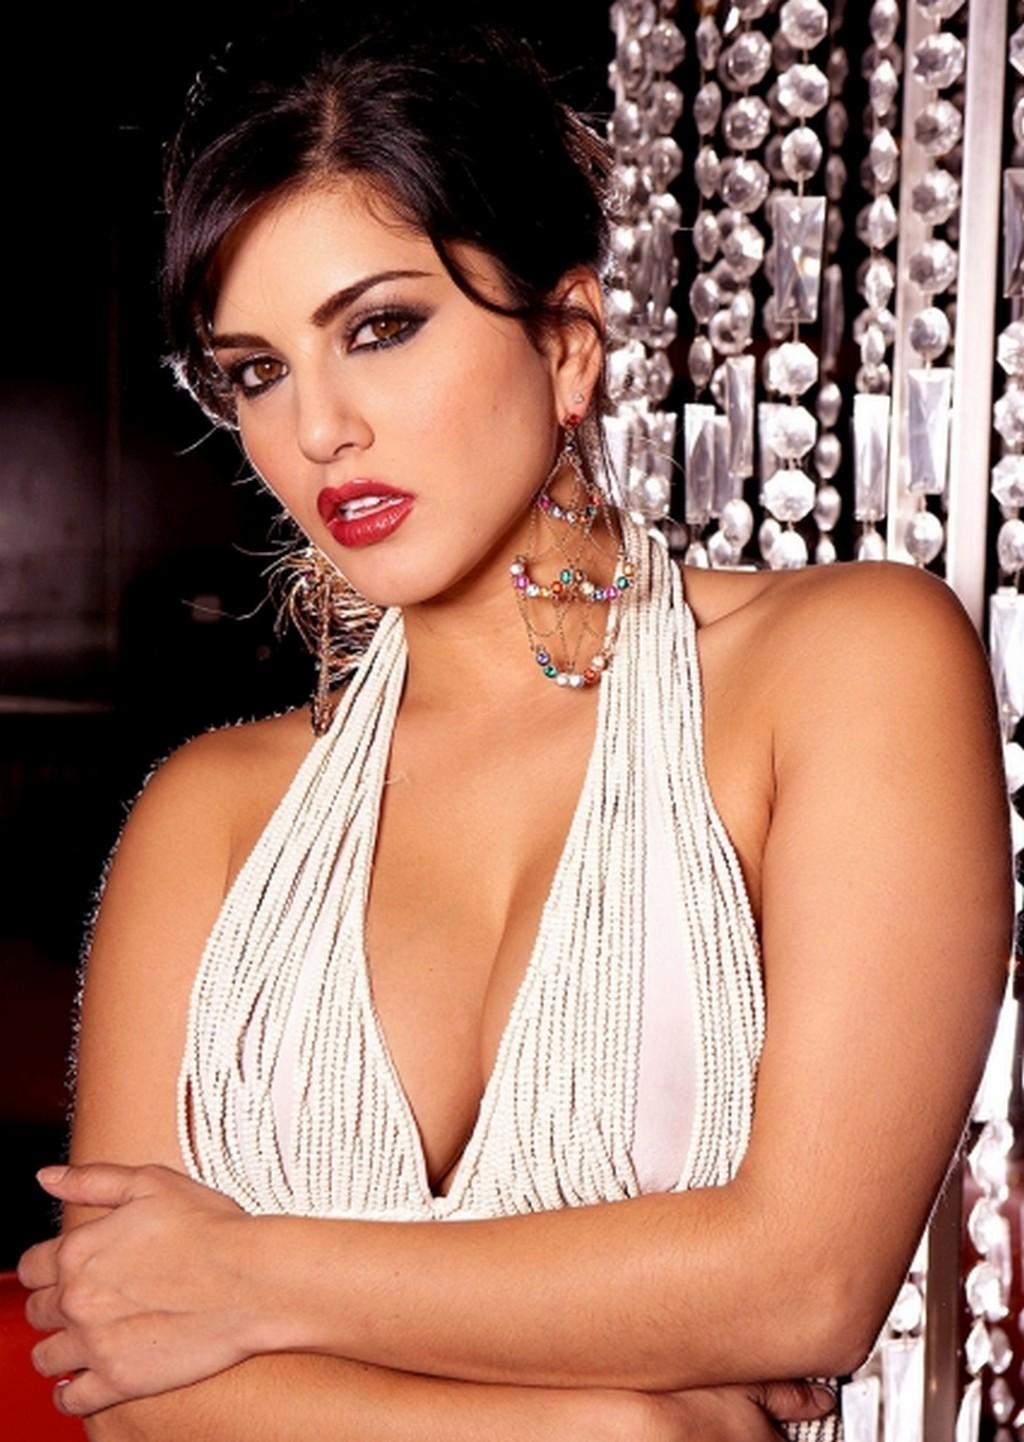 Sunny Leone Latest Spicy White Dress Photoshoot 2013 -5860